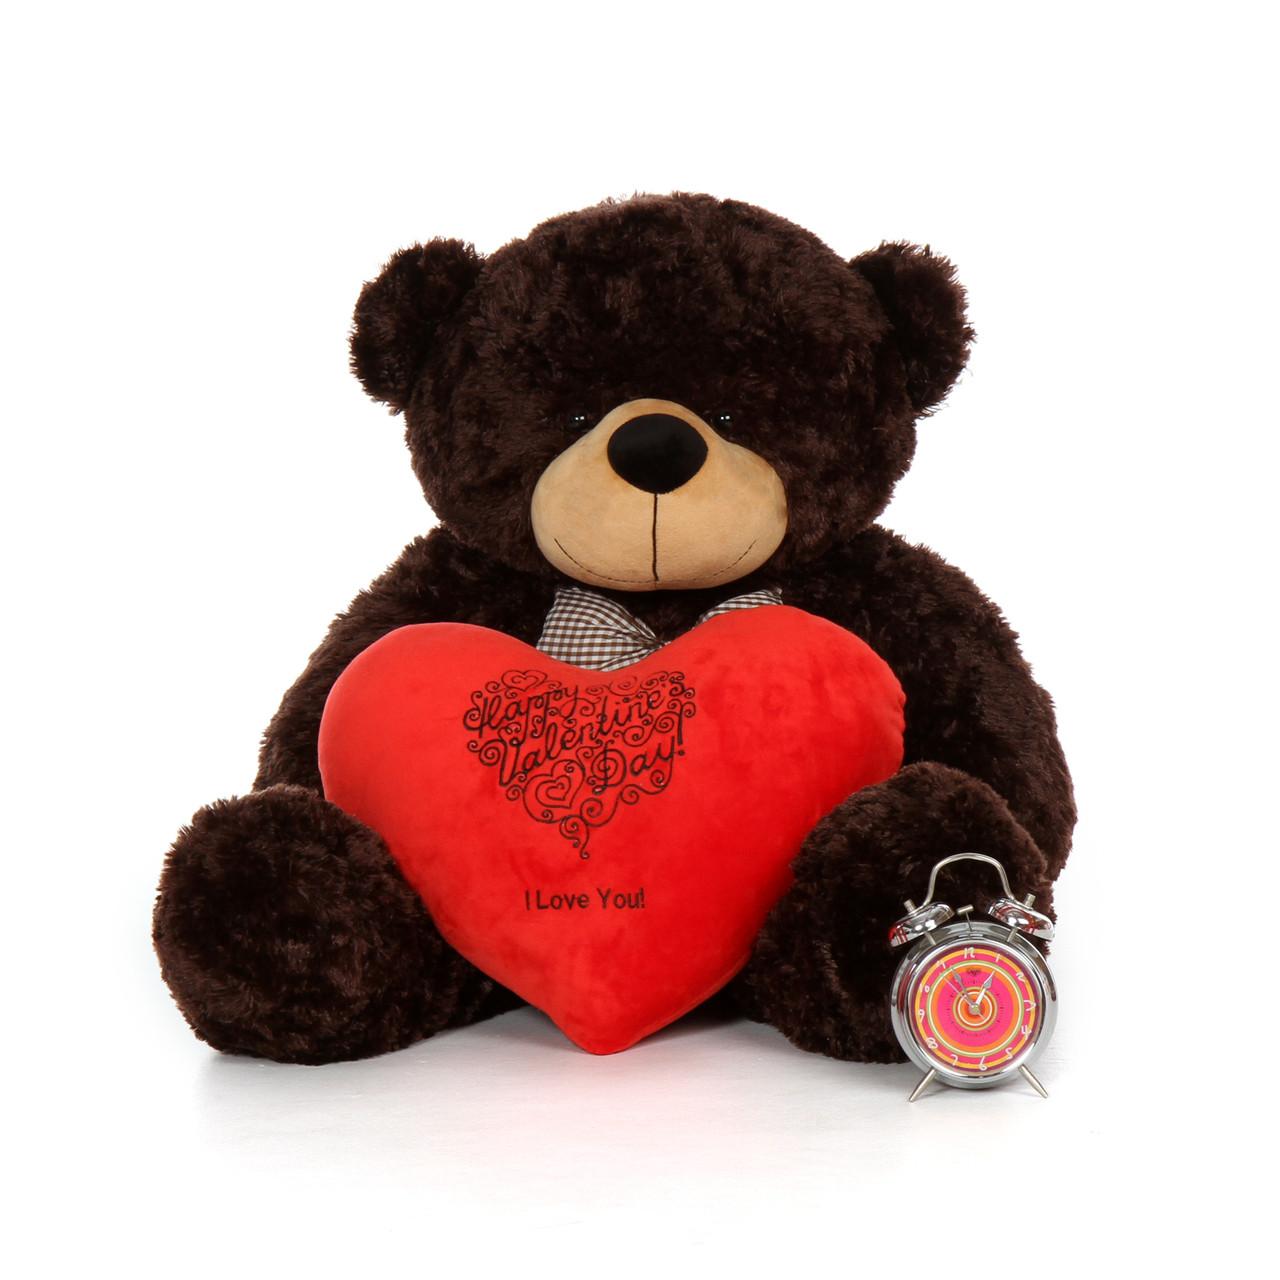 3 Foot Happy Valentines Day I Love You Teddy Bear Plush